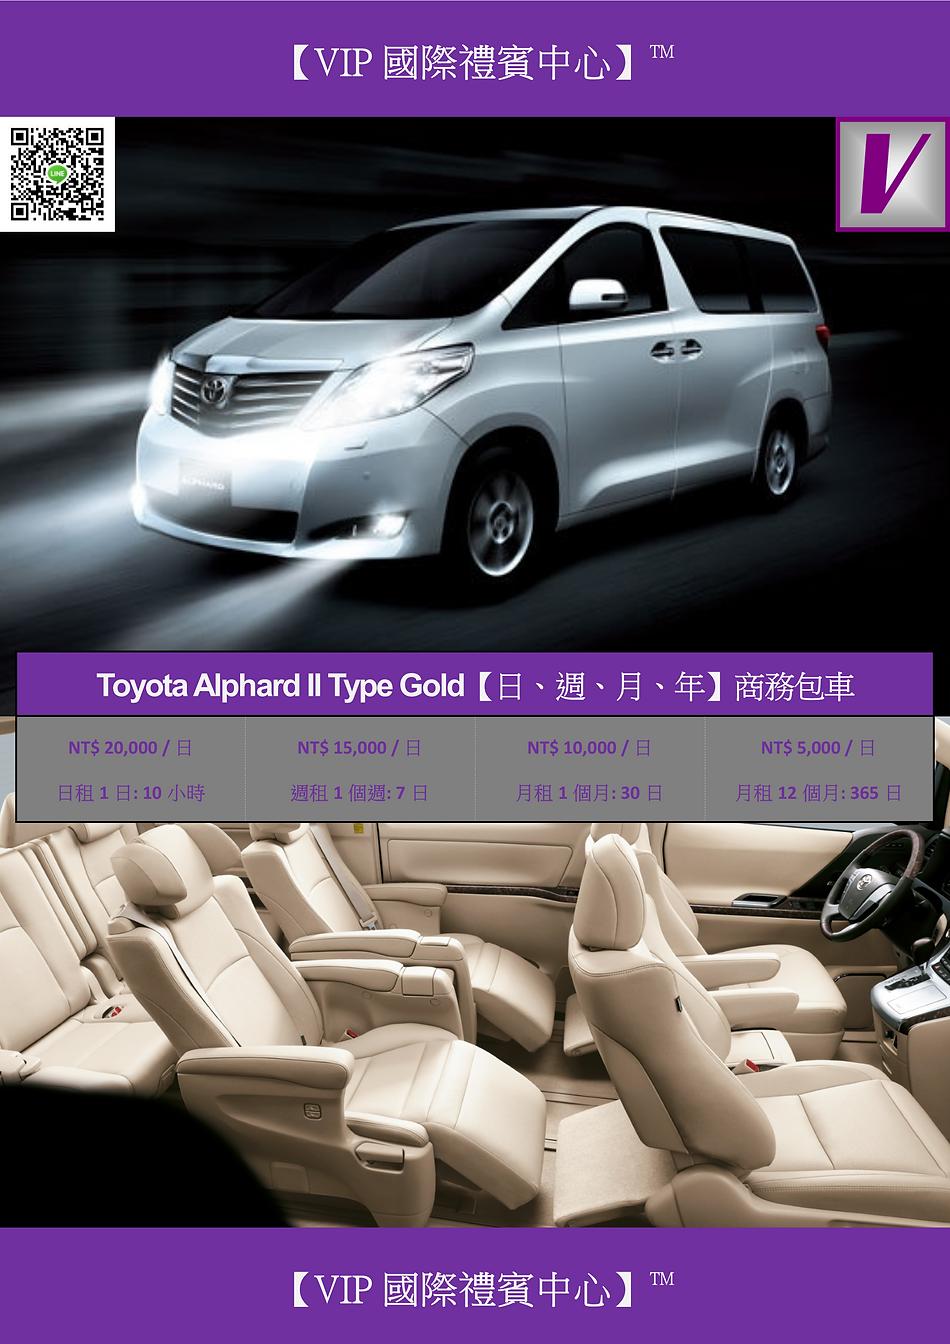 VIP國際禮賓中心 TOYOTA ALPHARD II TYPE GOLD 臺北市區接送包車